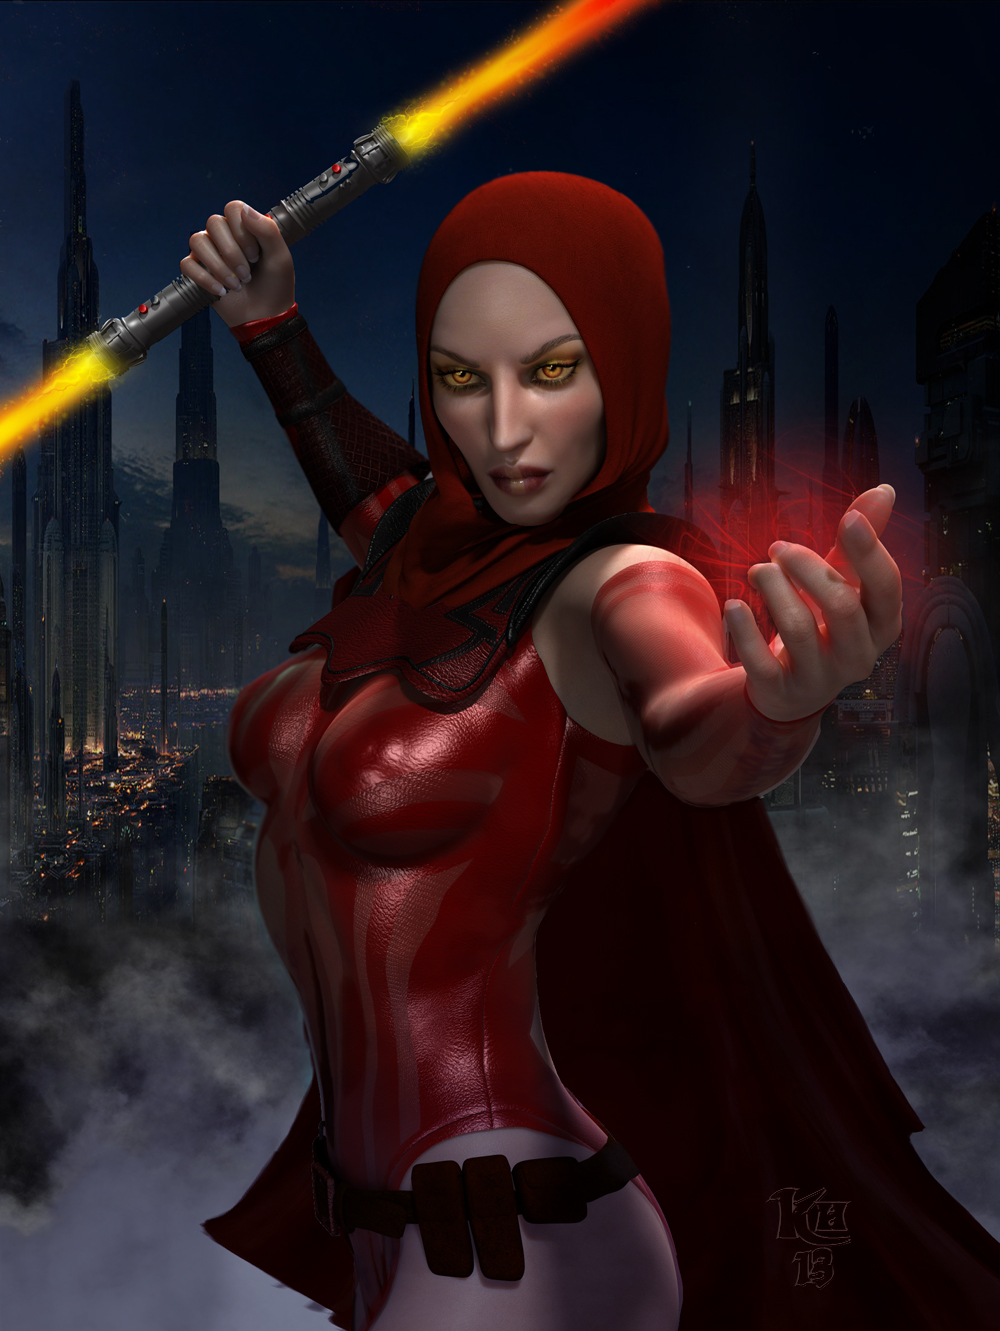 Sith Happens: Assassin by Erulian